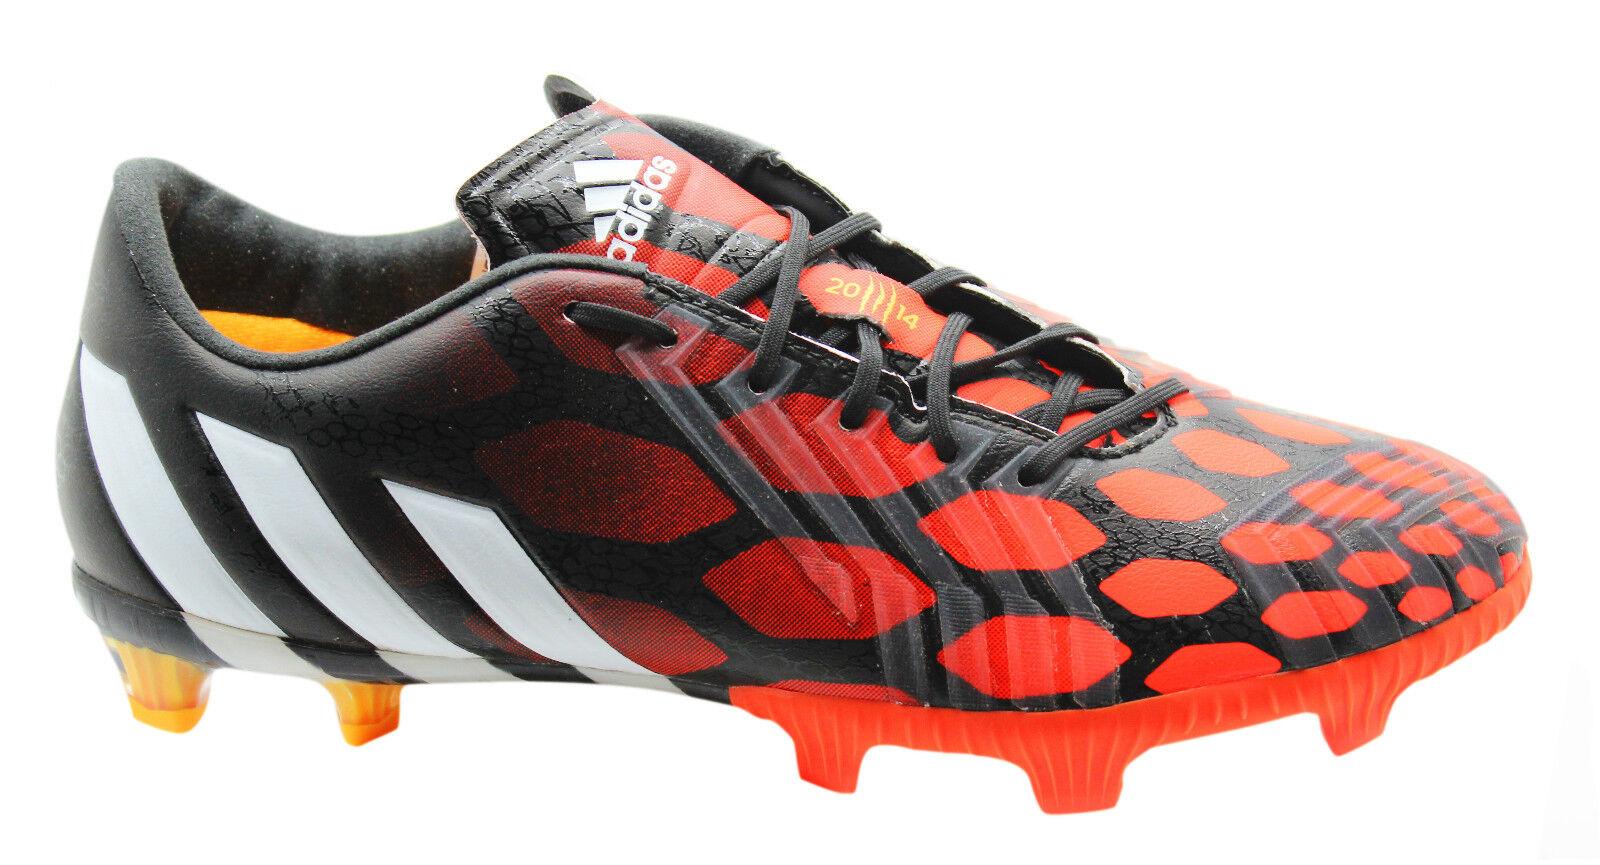 Adidas ProjoATOR INSTINCT FG botas de fútbol de hombre de tierra firme Negro M17643 WH